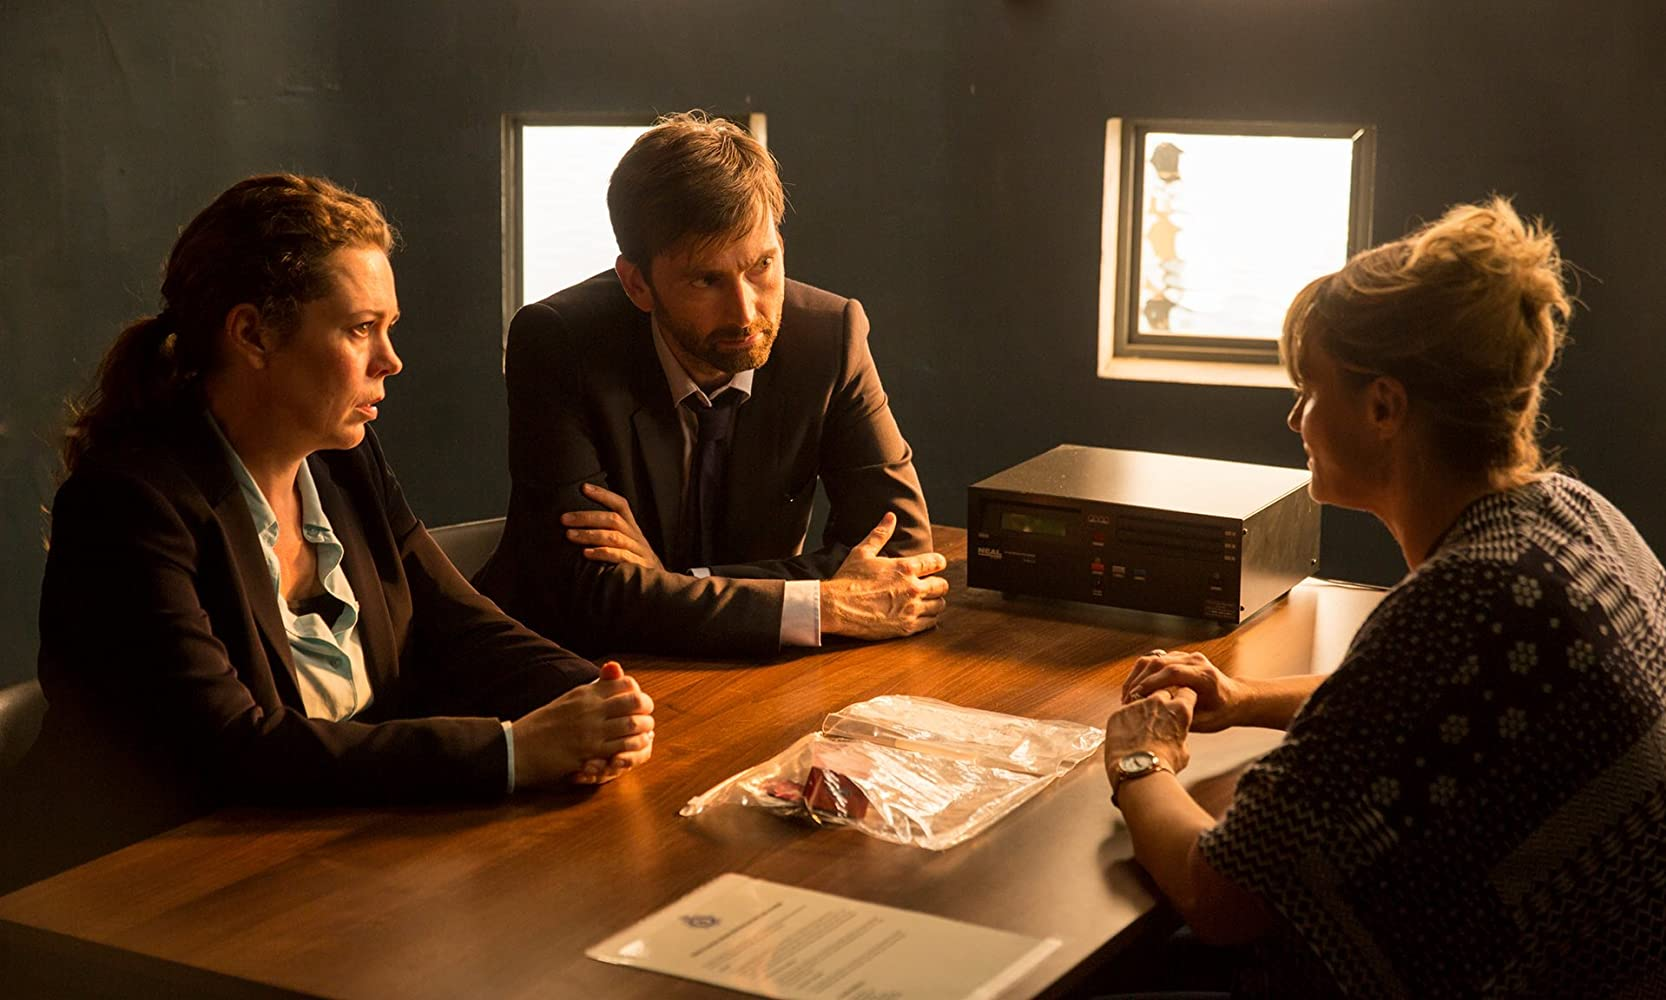 Sarah Parish, David Tennant, and Olivia Colman in Broadchurch (2013)